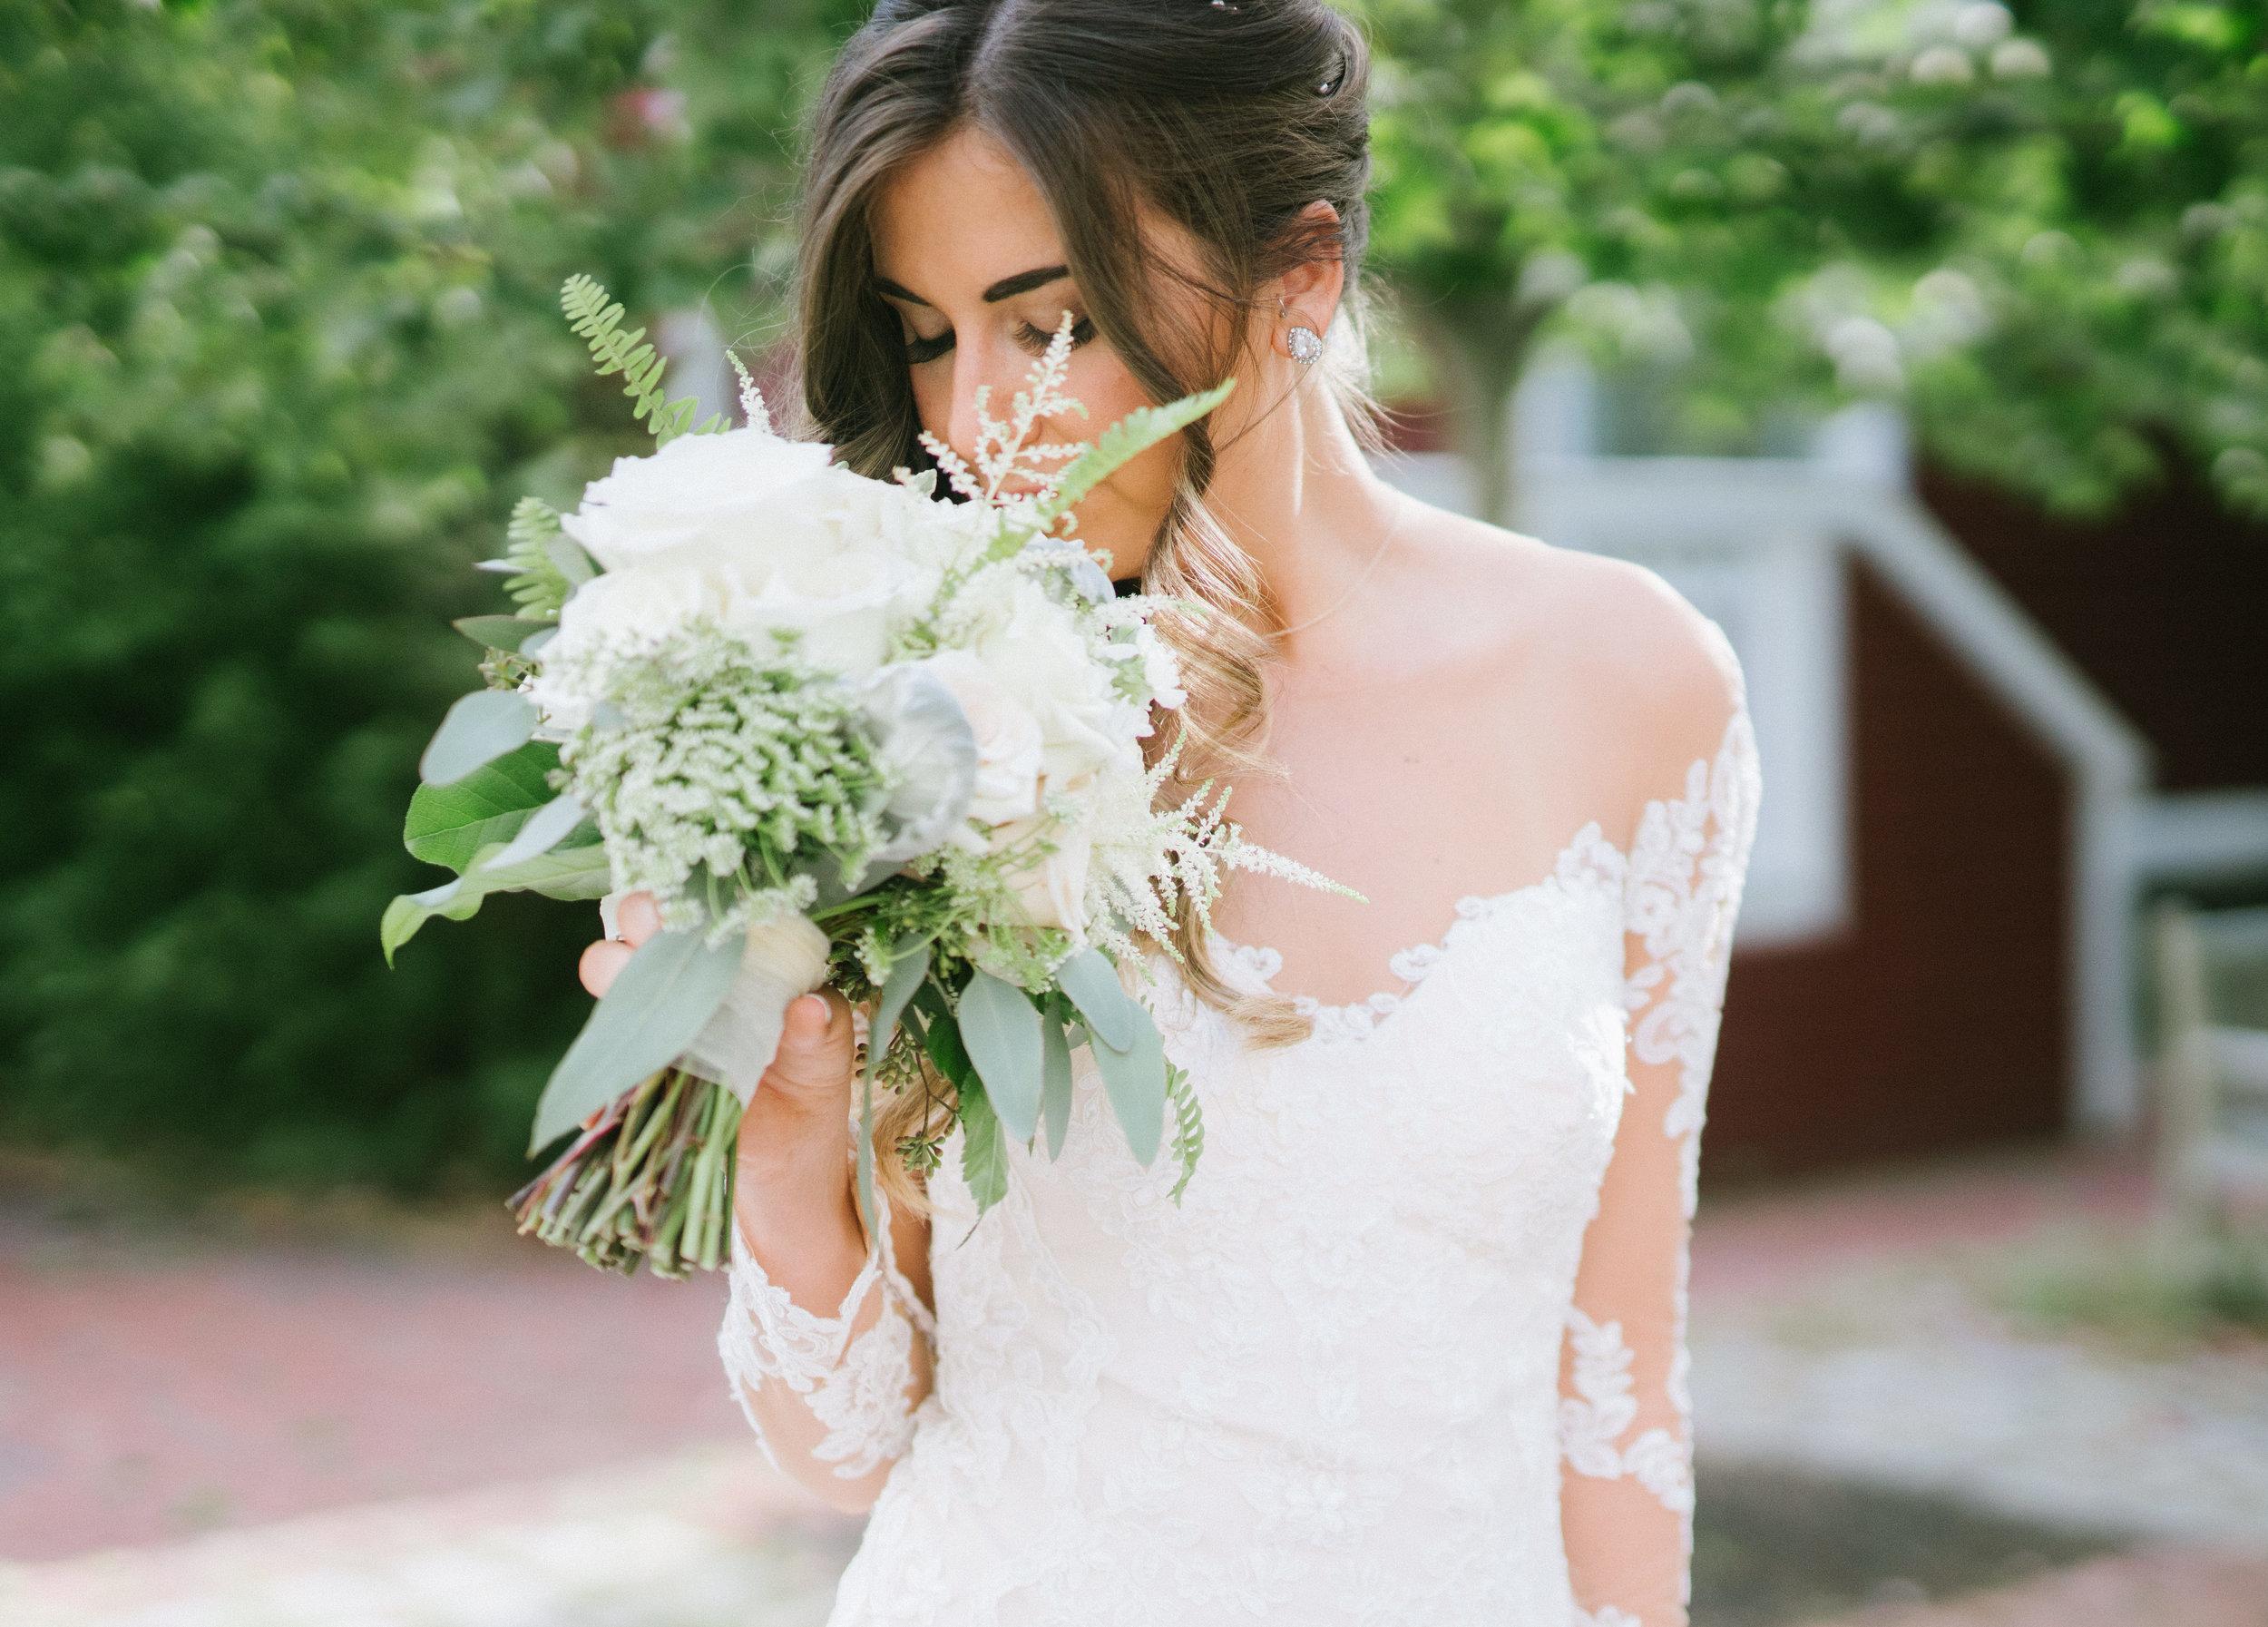 Nicolette & Brad | Wedding | Rhode Island | Sep 11, 2016 |  Highlights-0049.jpg